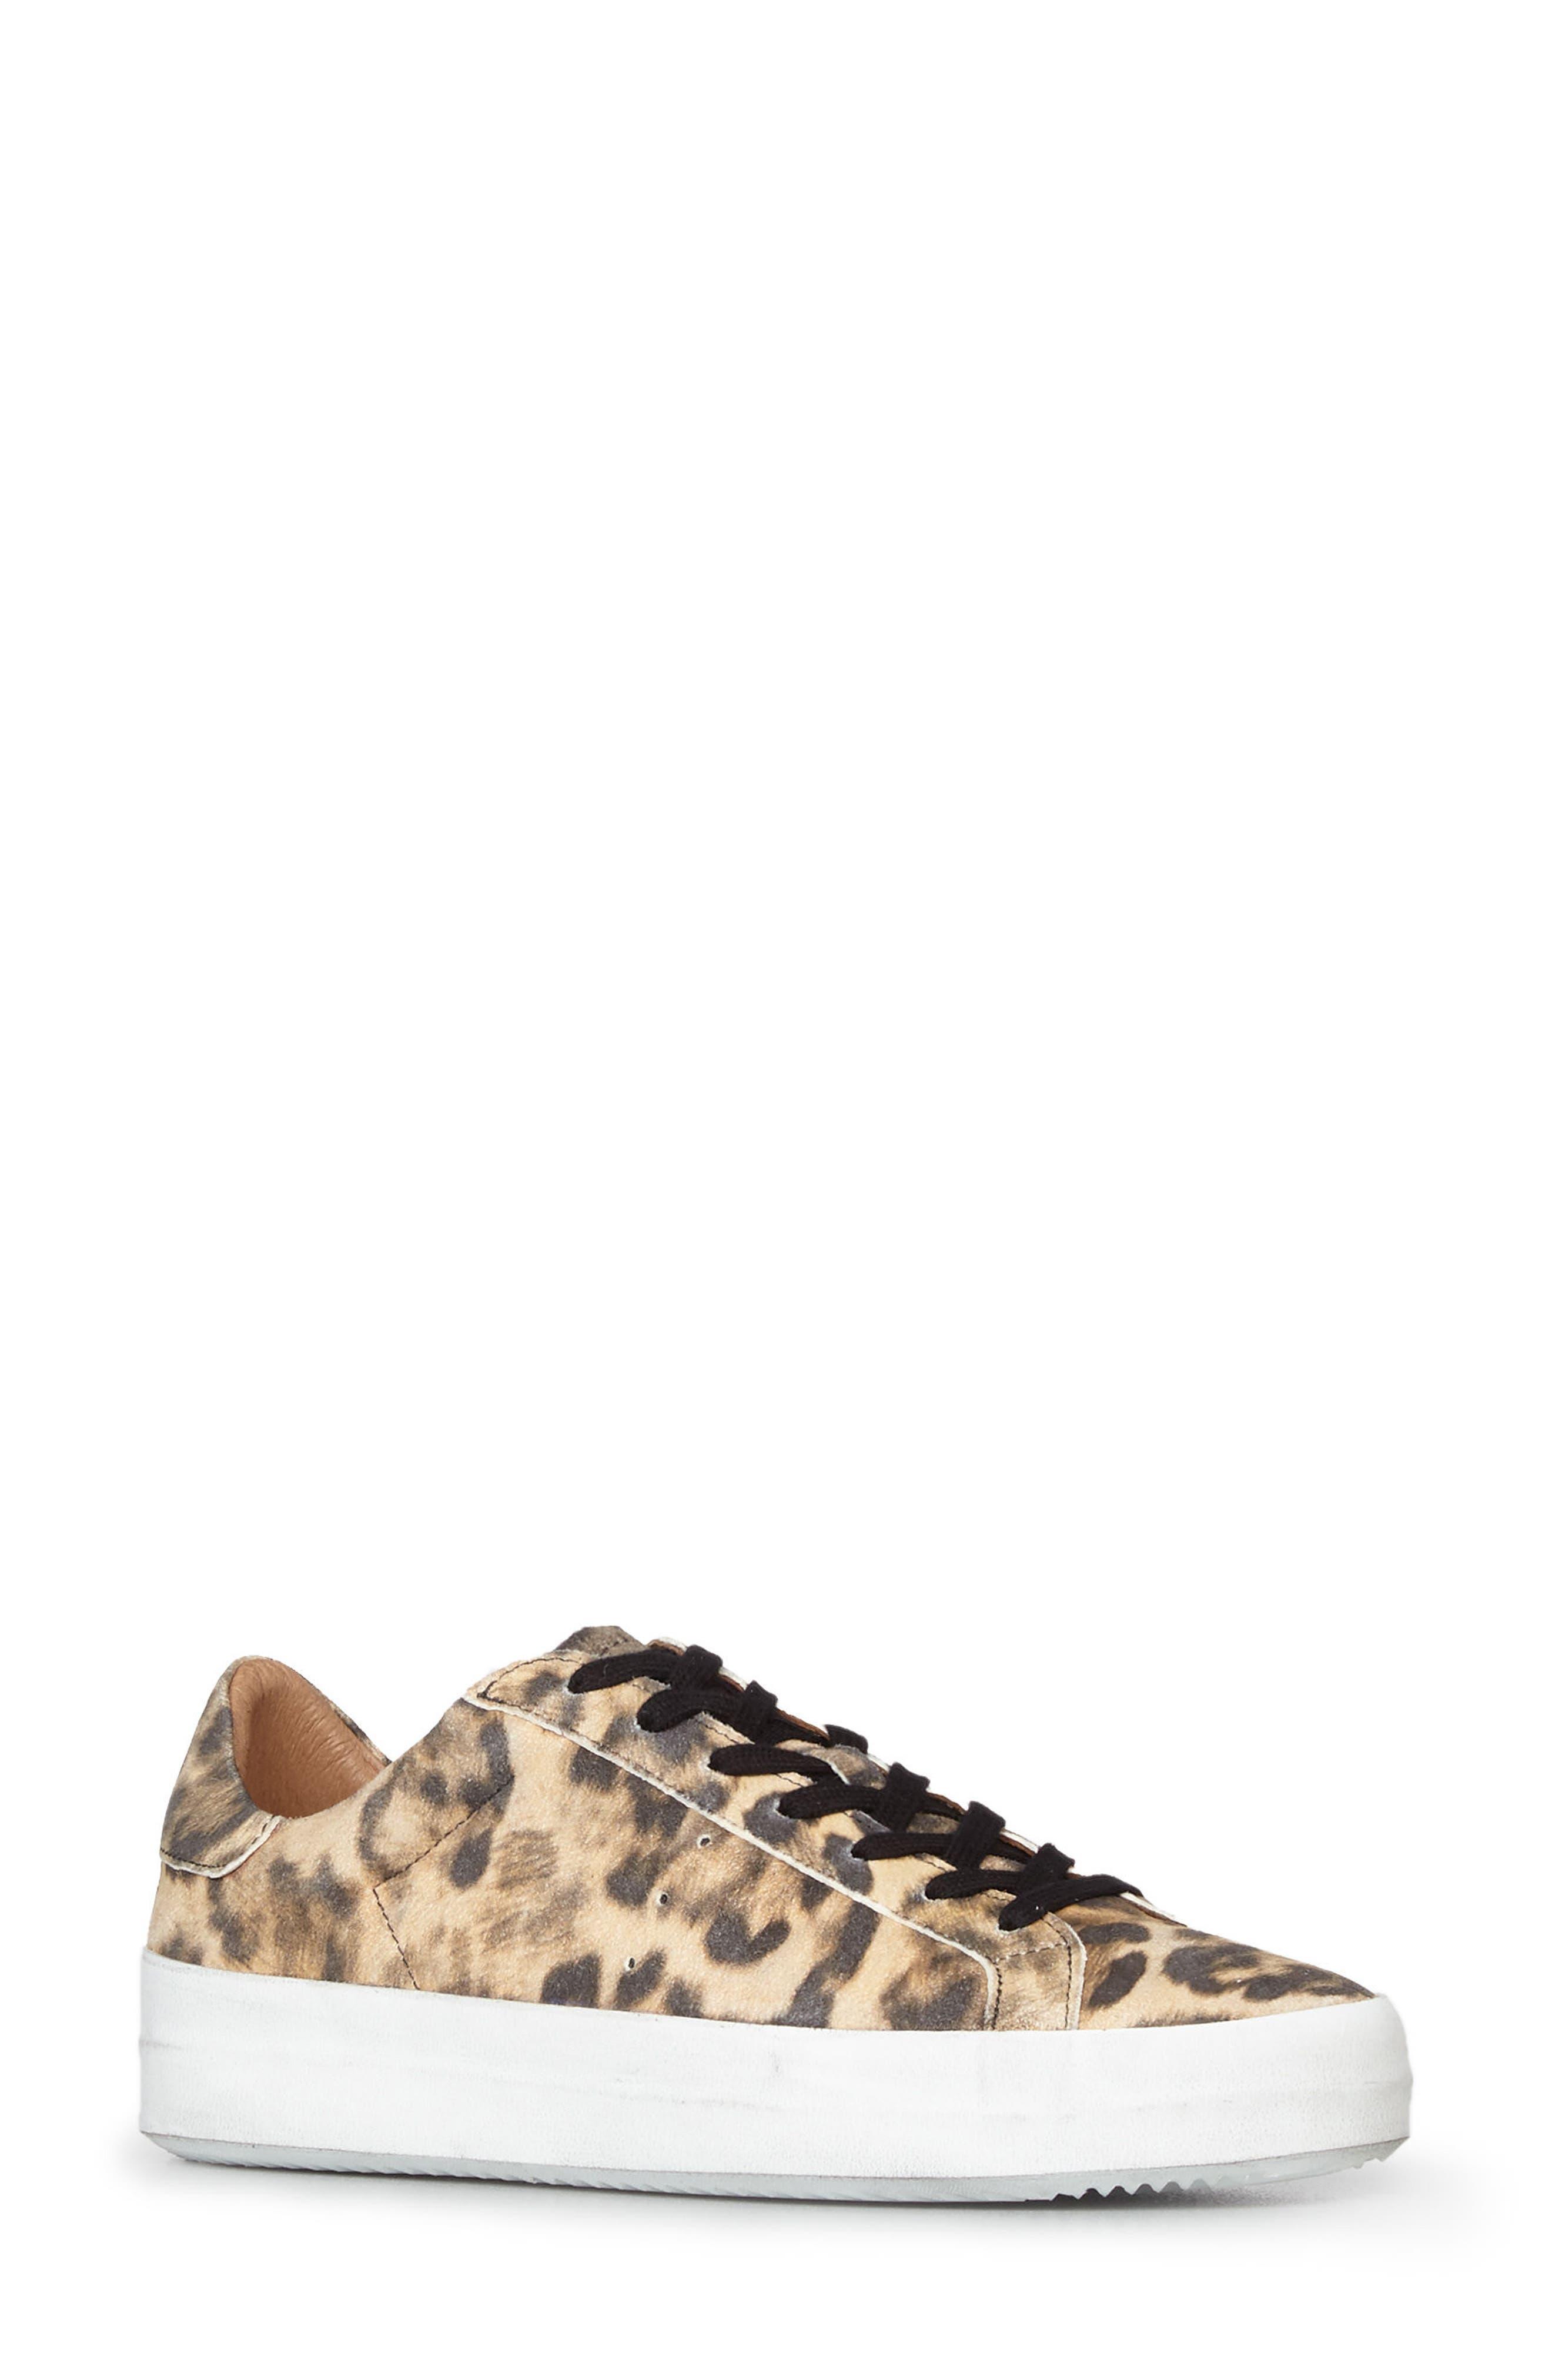 Main Image - ALLSAINTS Safia Sneaker (Women)